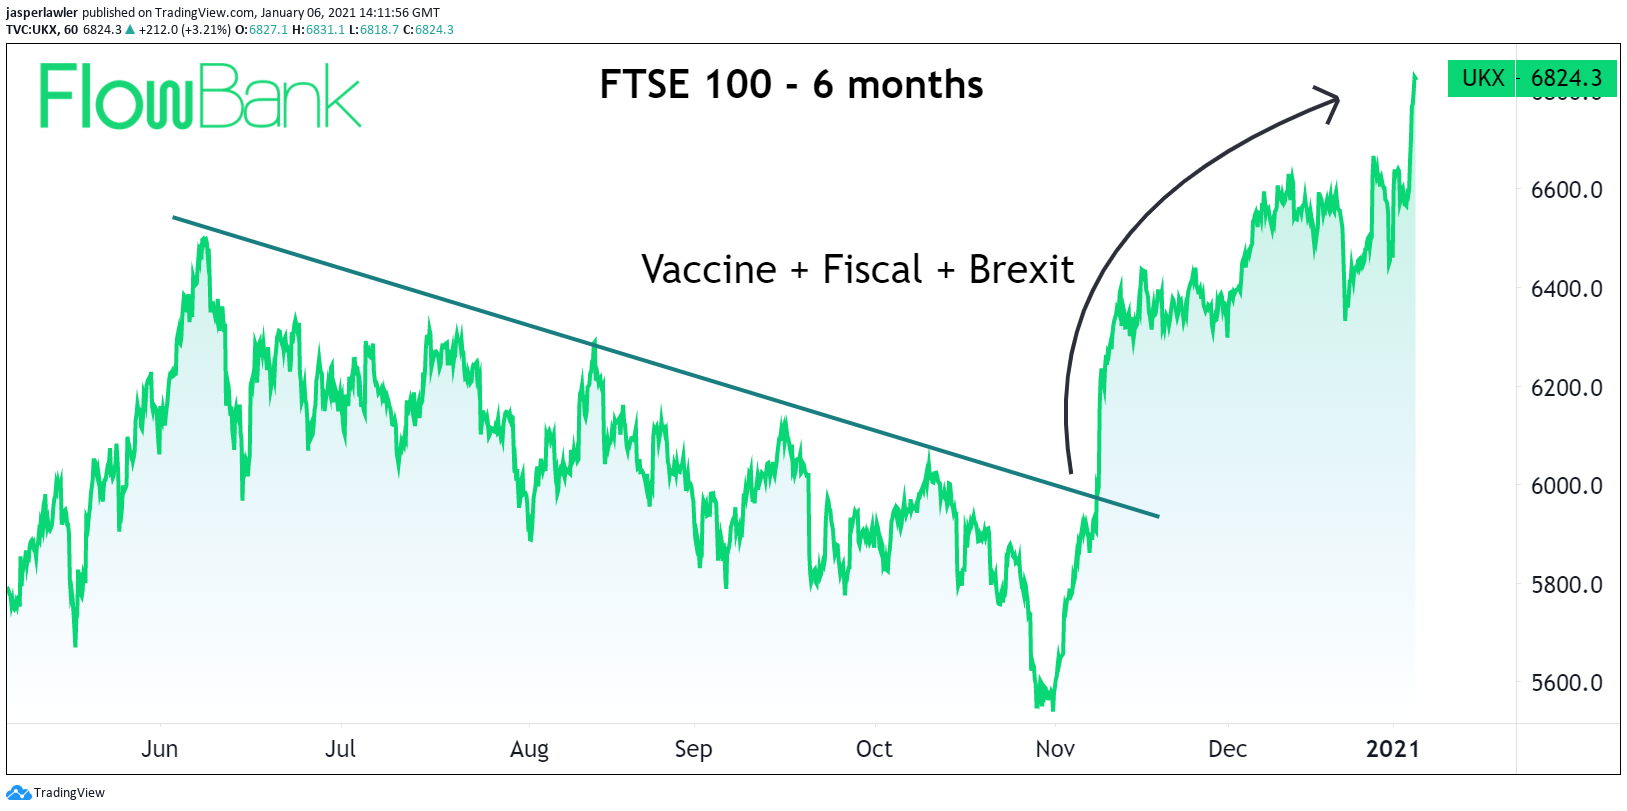 ftse 100 index 6 months